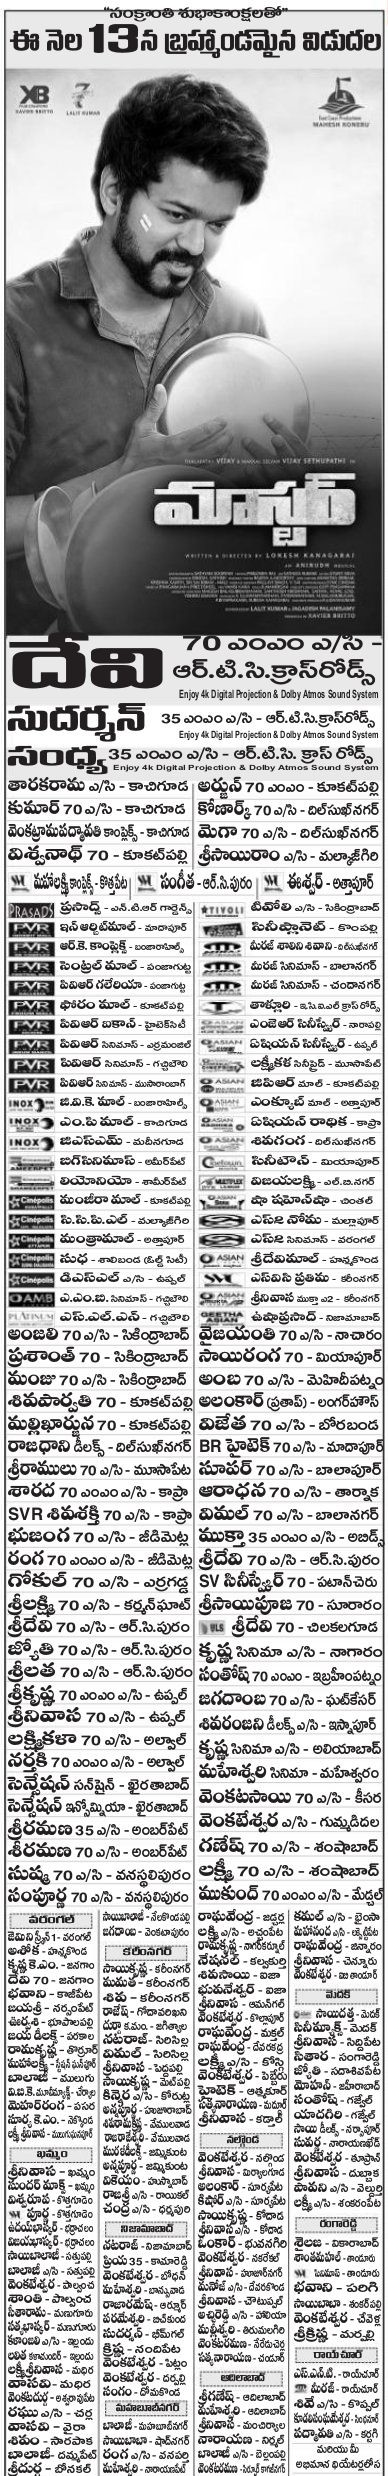 Vijay's 'master' Hyderabad And Nizam Theaters List